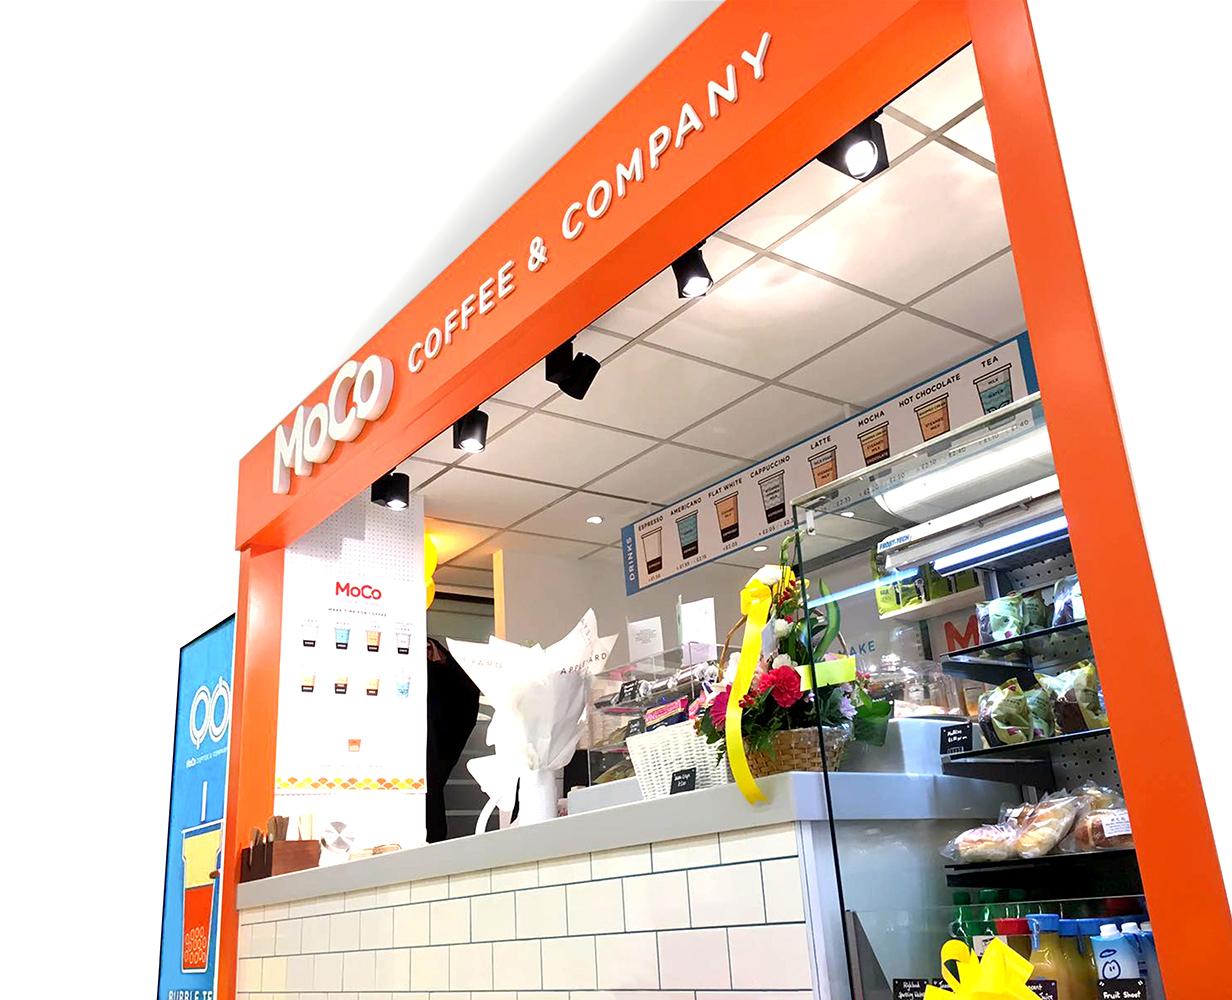 MoCo Coffee & Company kiosk design